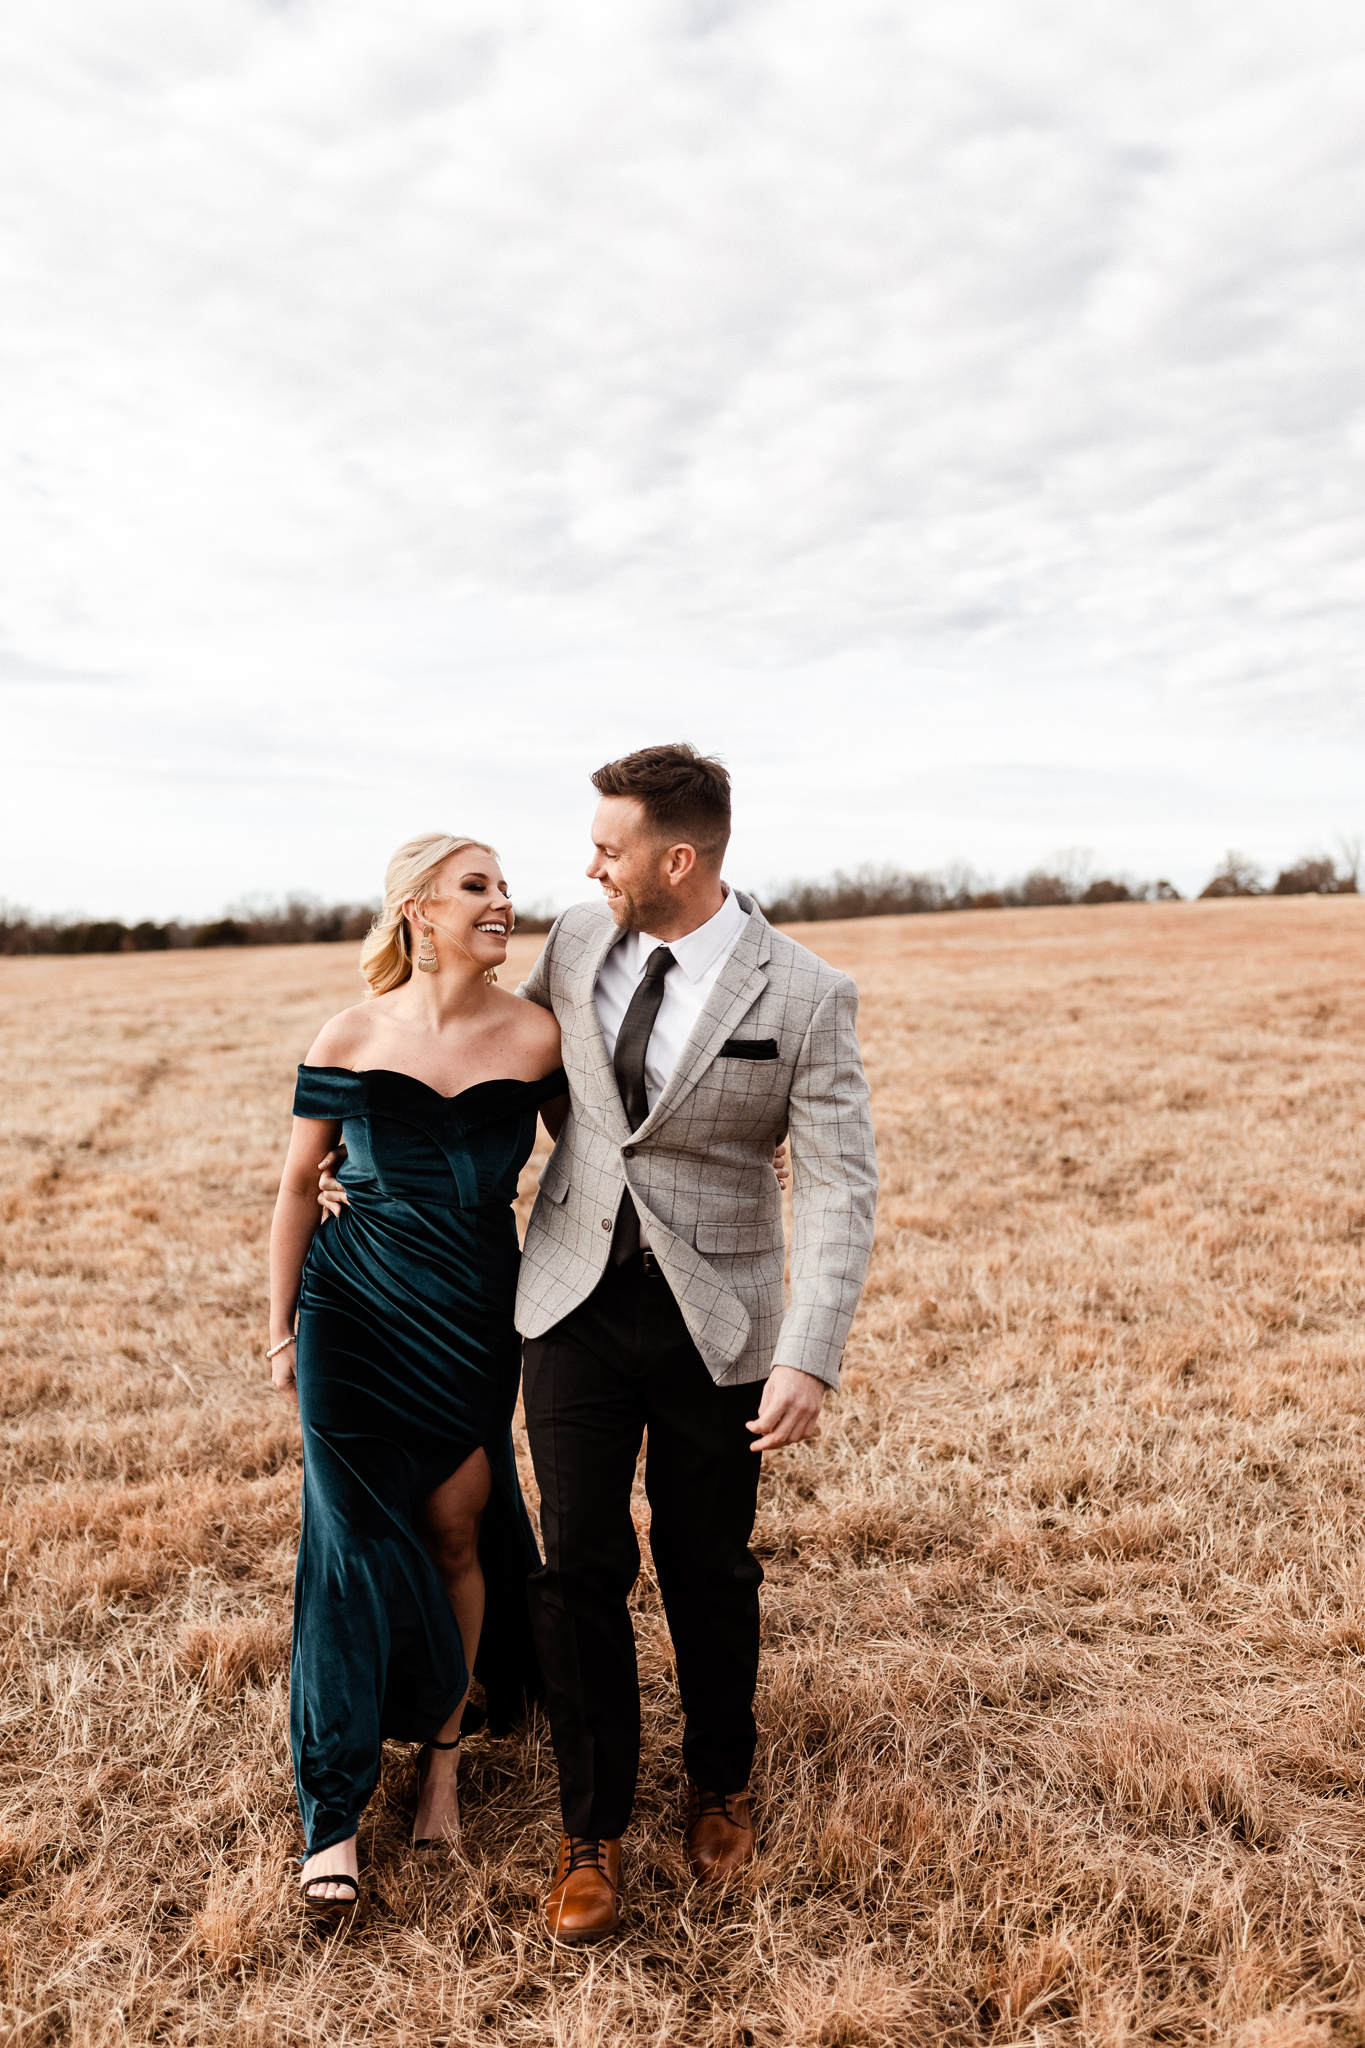 Wade + Stephanie | Warm Open Field Engagements | Oklahoma Wedding Photographer-20.jpg